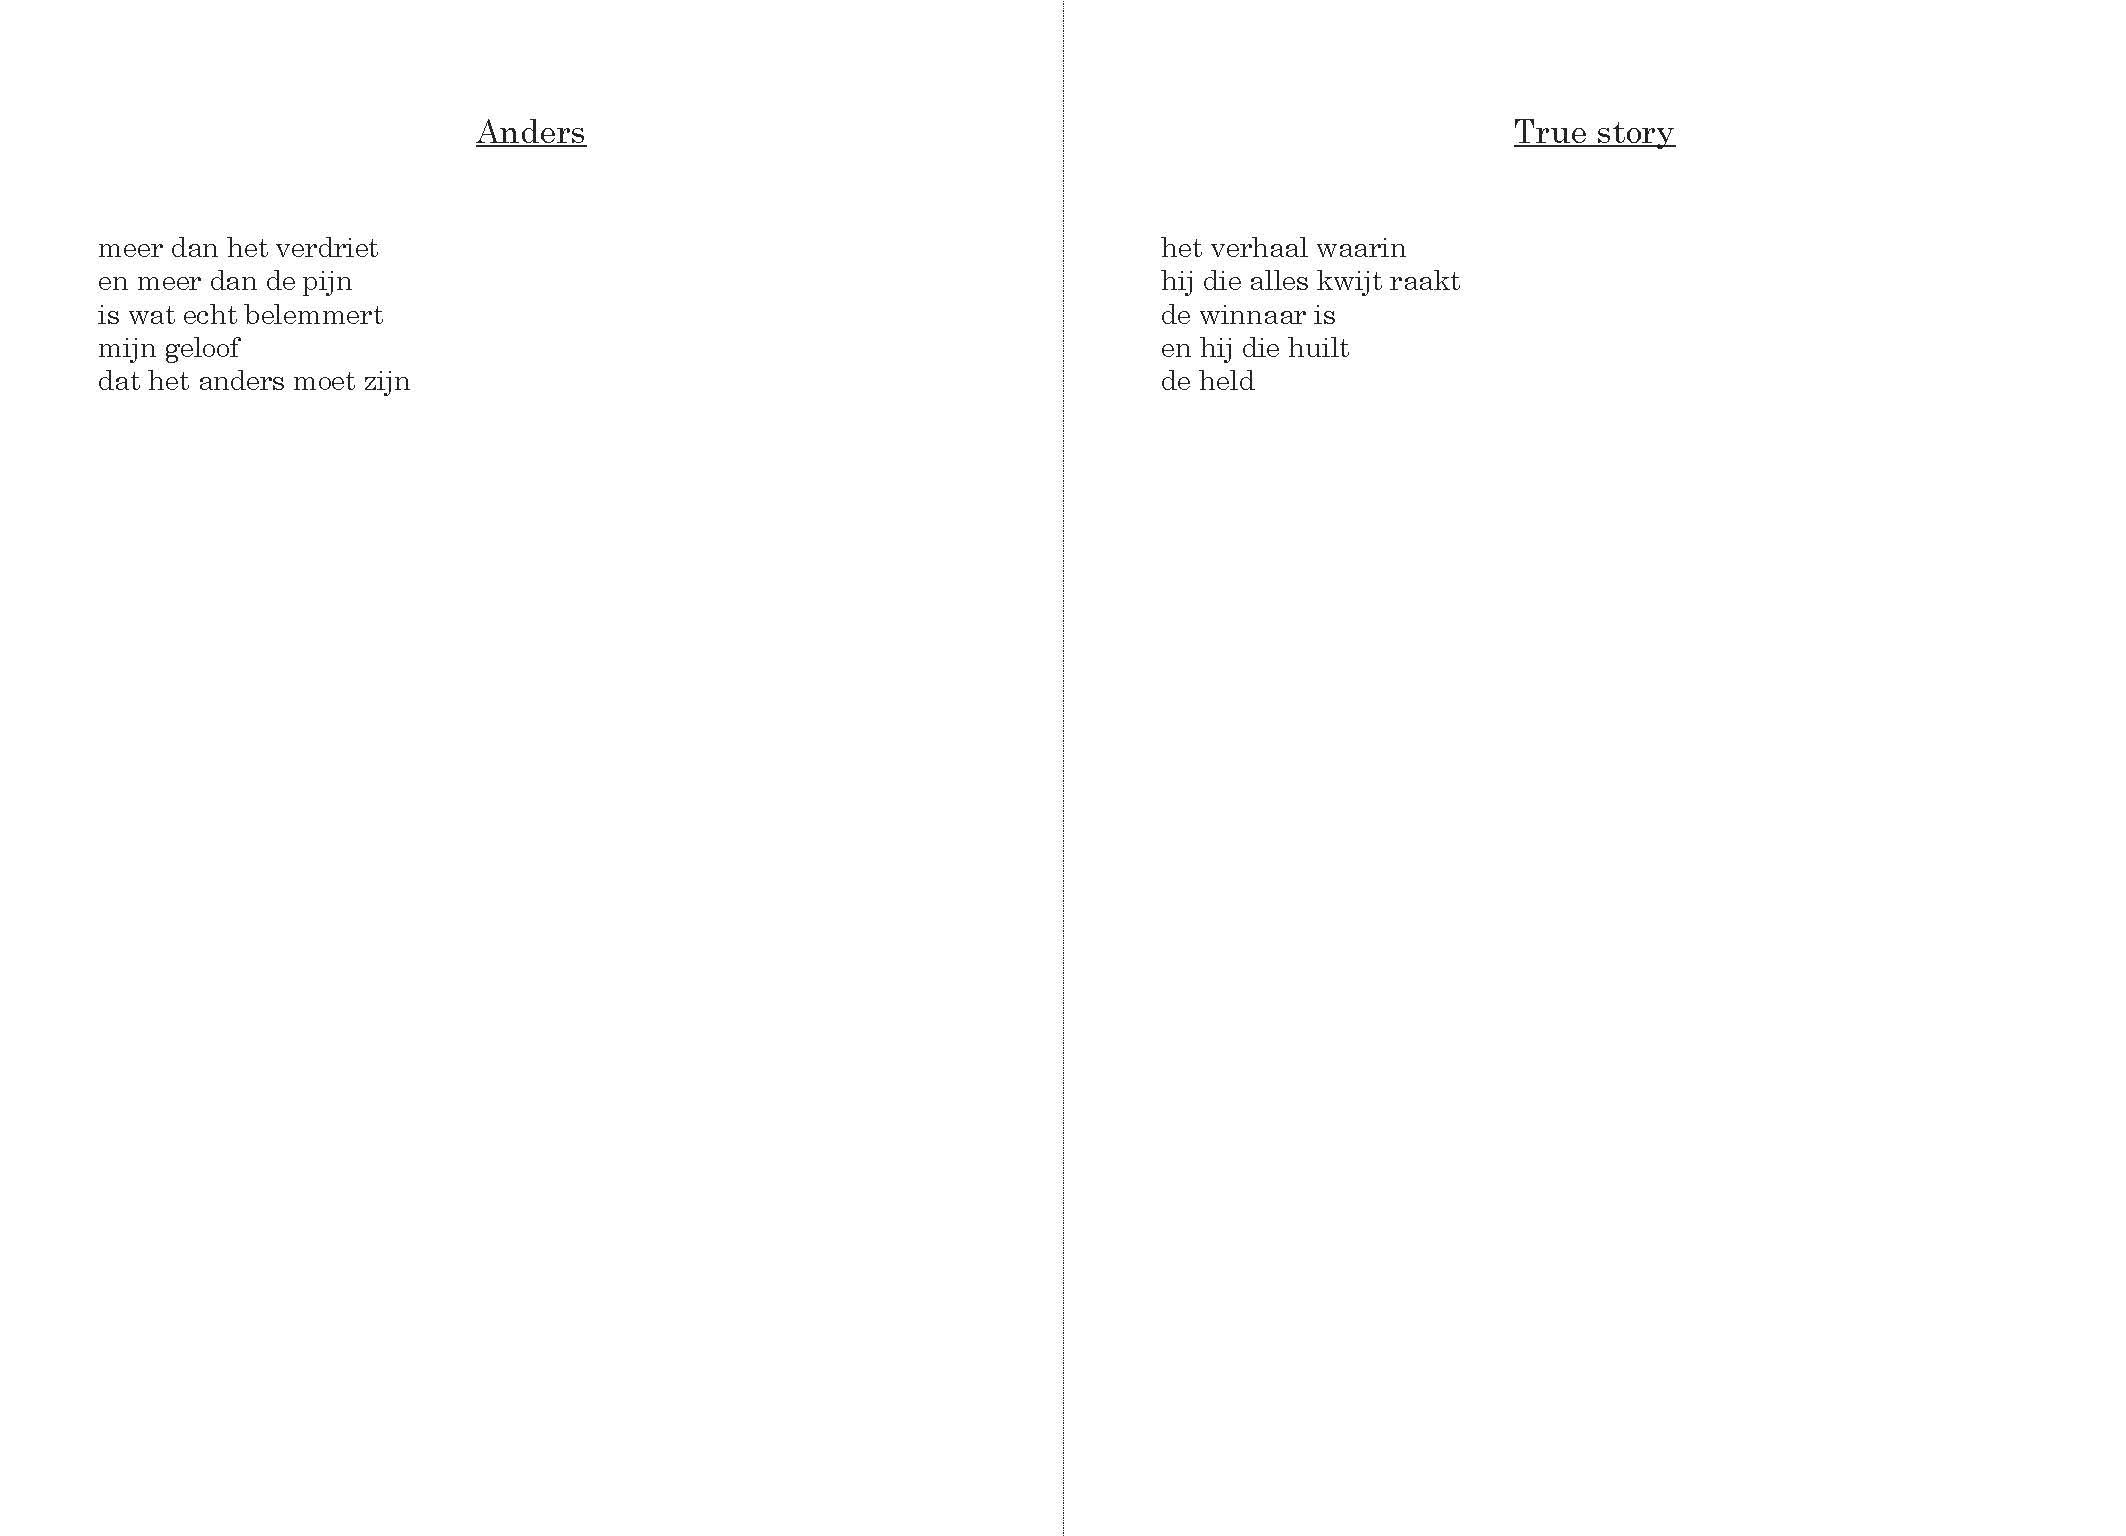 Manuscript-Selfie-YildauterBeek-Lang_Pagina_41.jpg